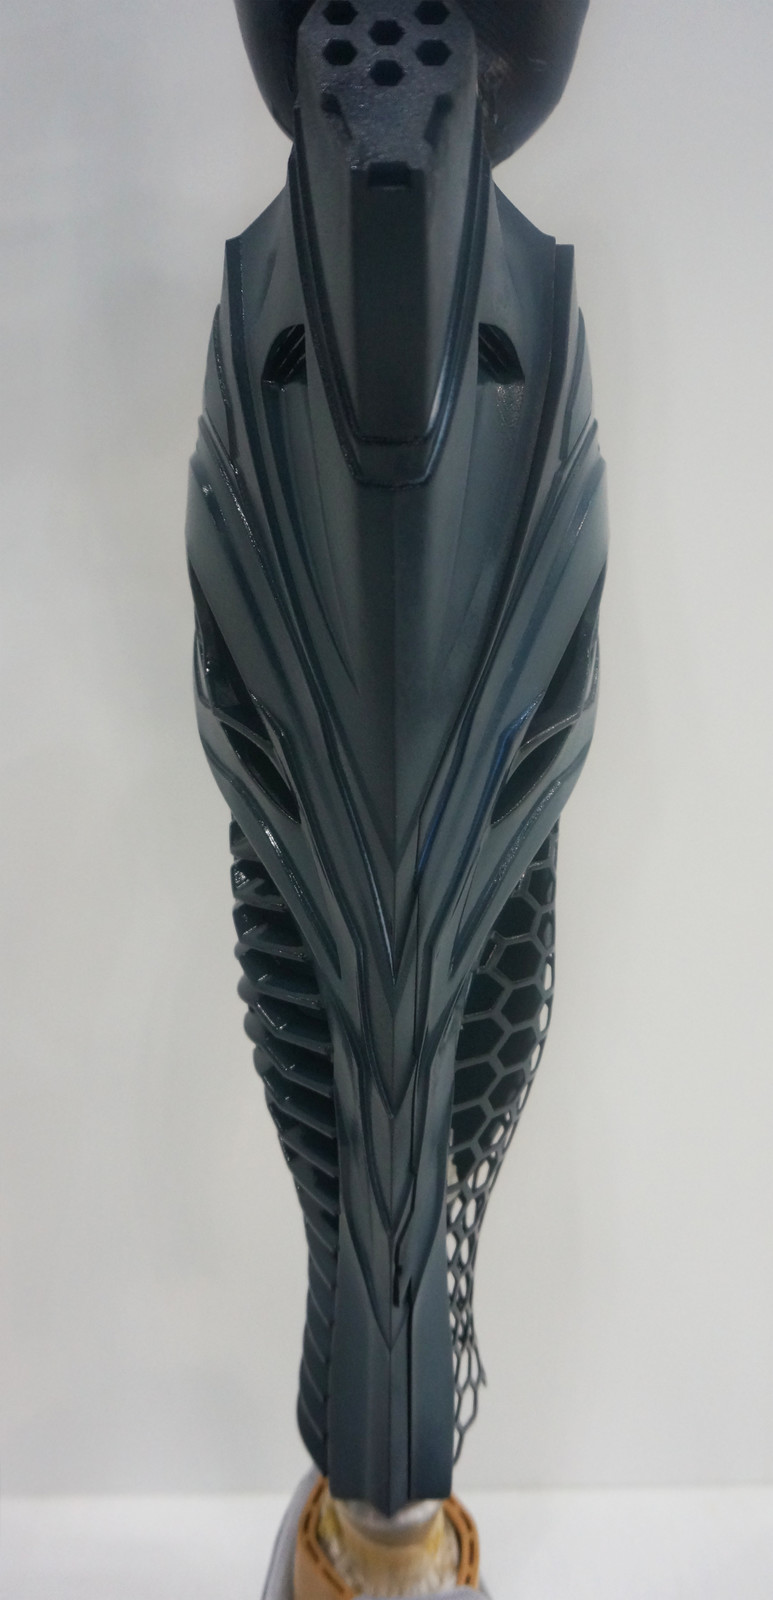 type-Unicorn, 3D printed prosthetic leg